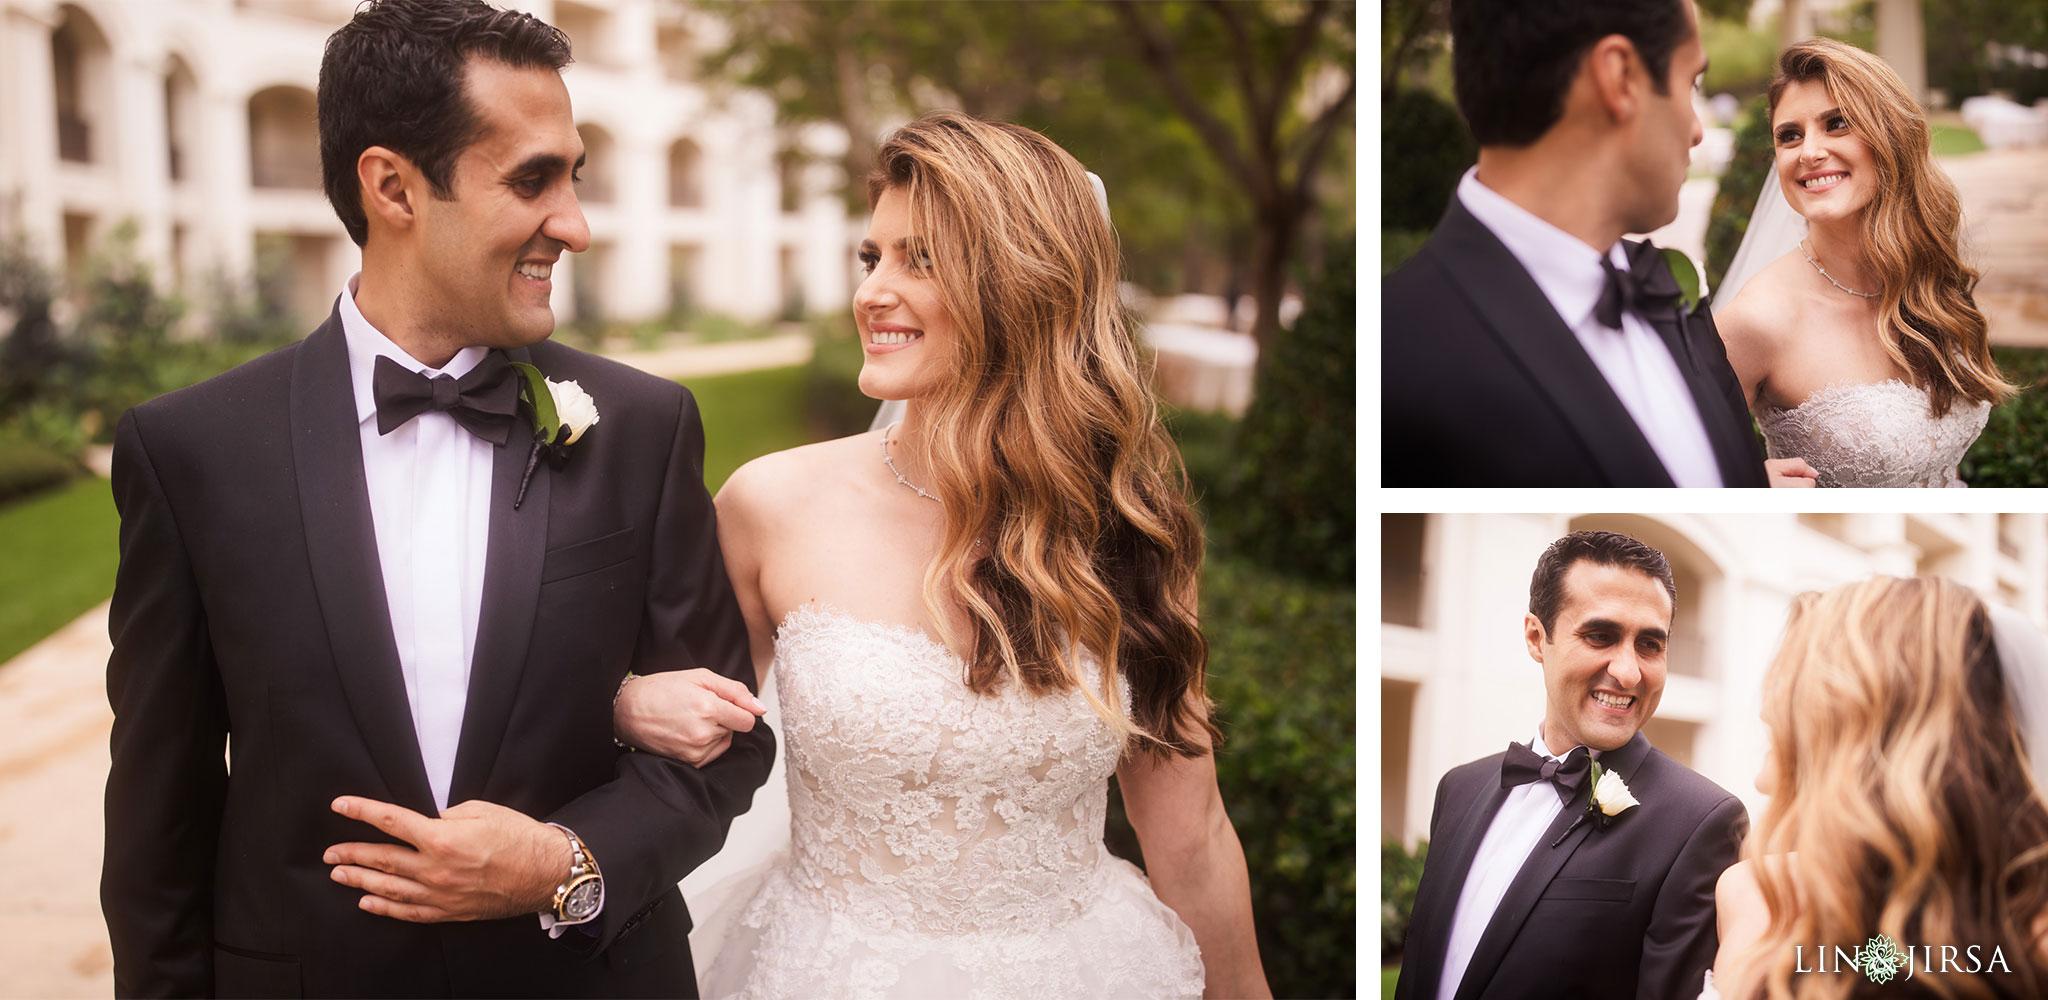 11 monarch beach resort laguna niguel persian wedding photography